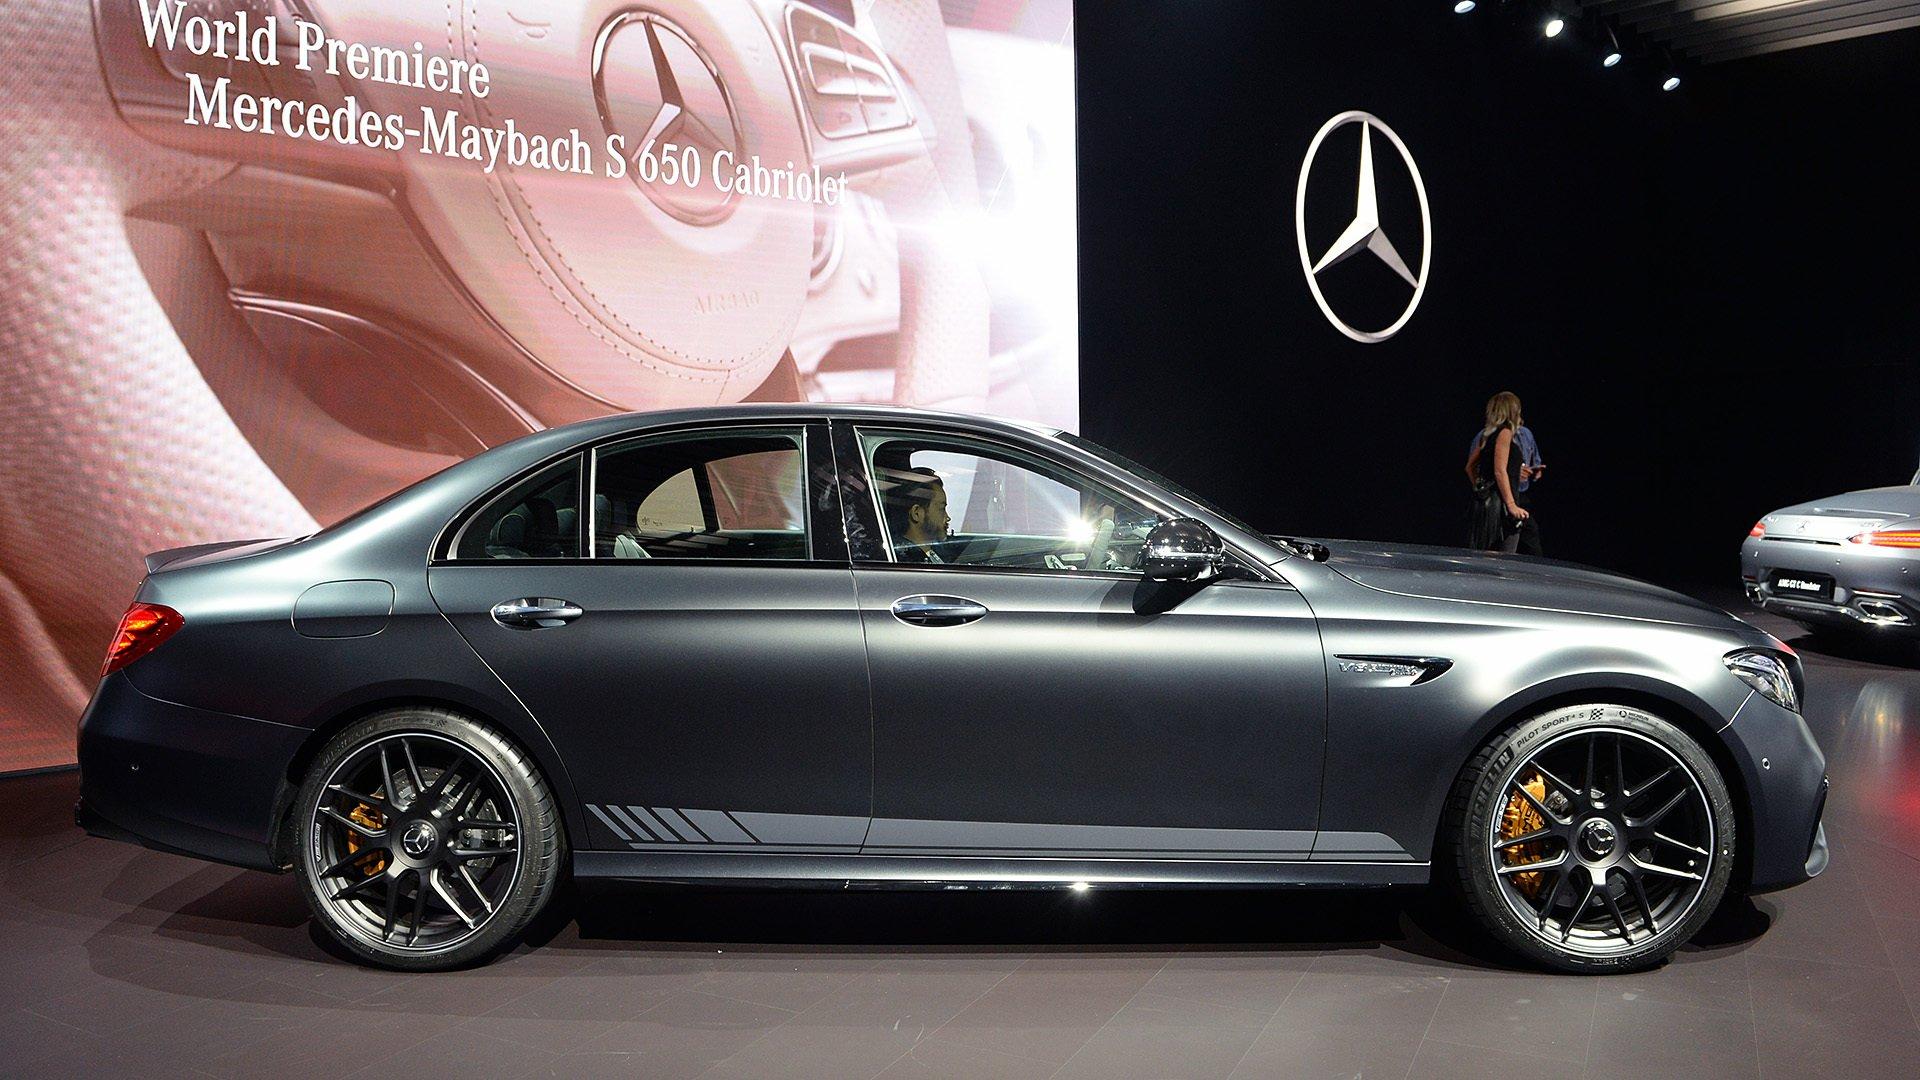 2017 mercedes amg e63s edition 1 cars black sedan. Black Bedroom Furniture Sets. Home Design Ideas